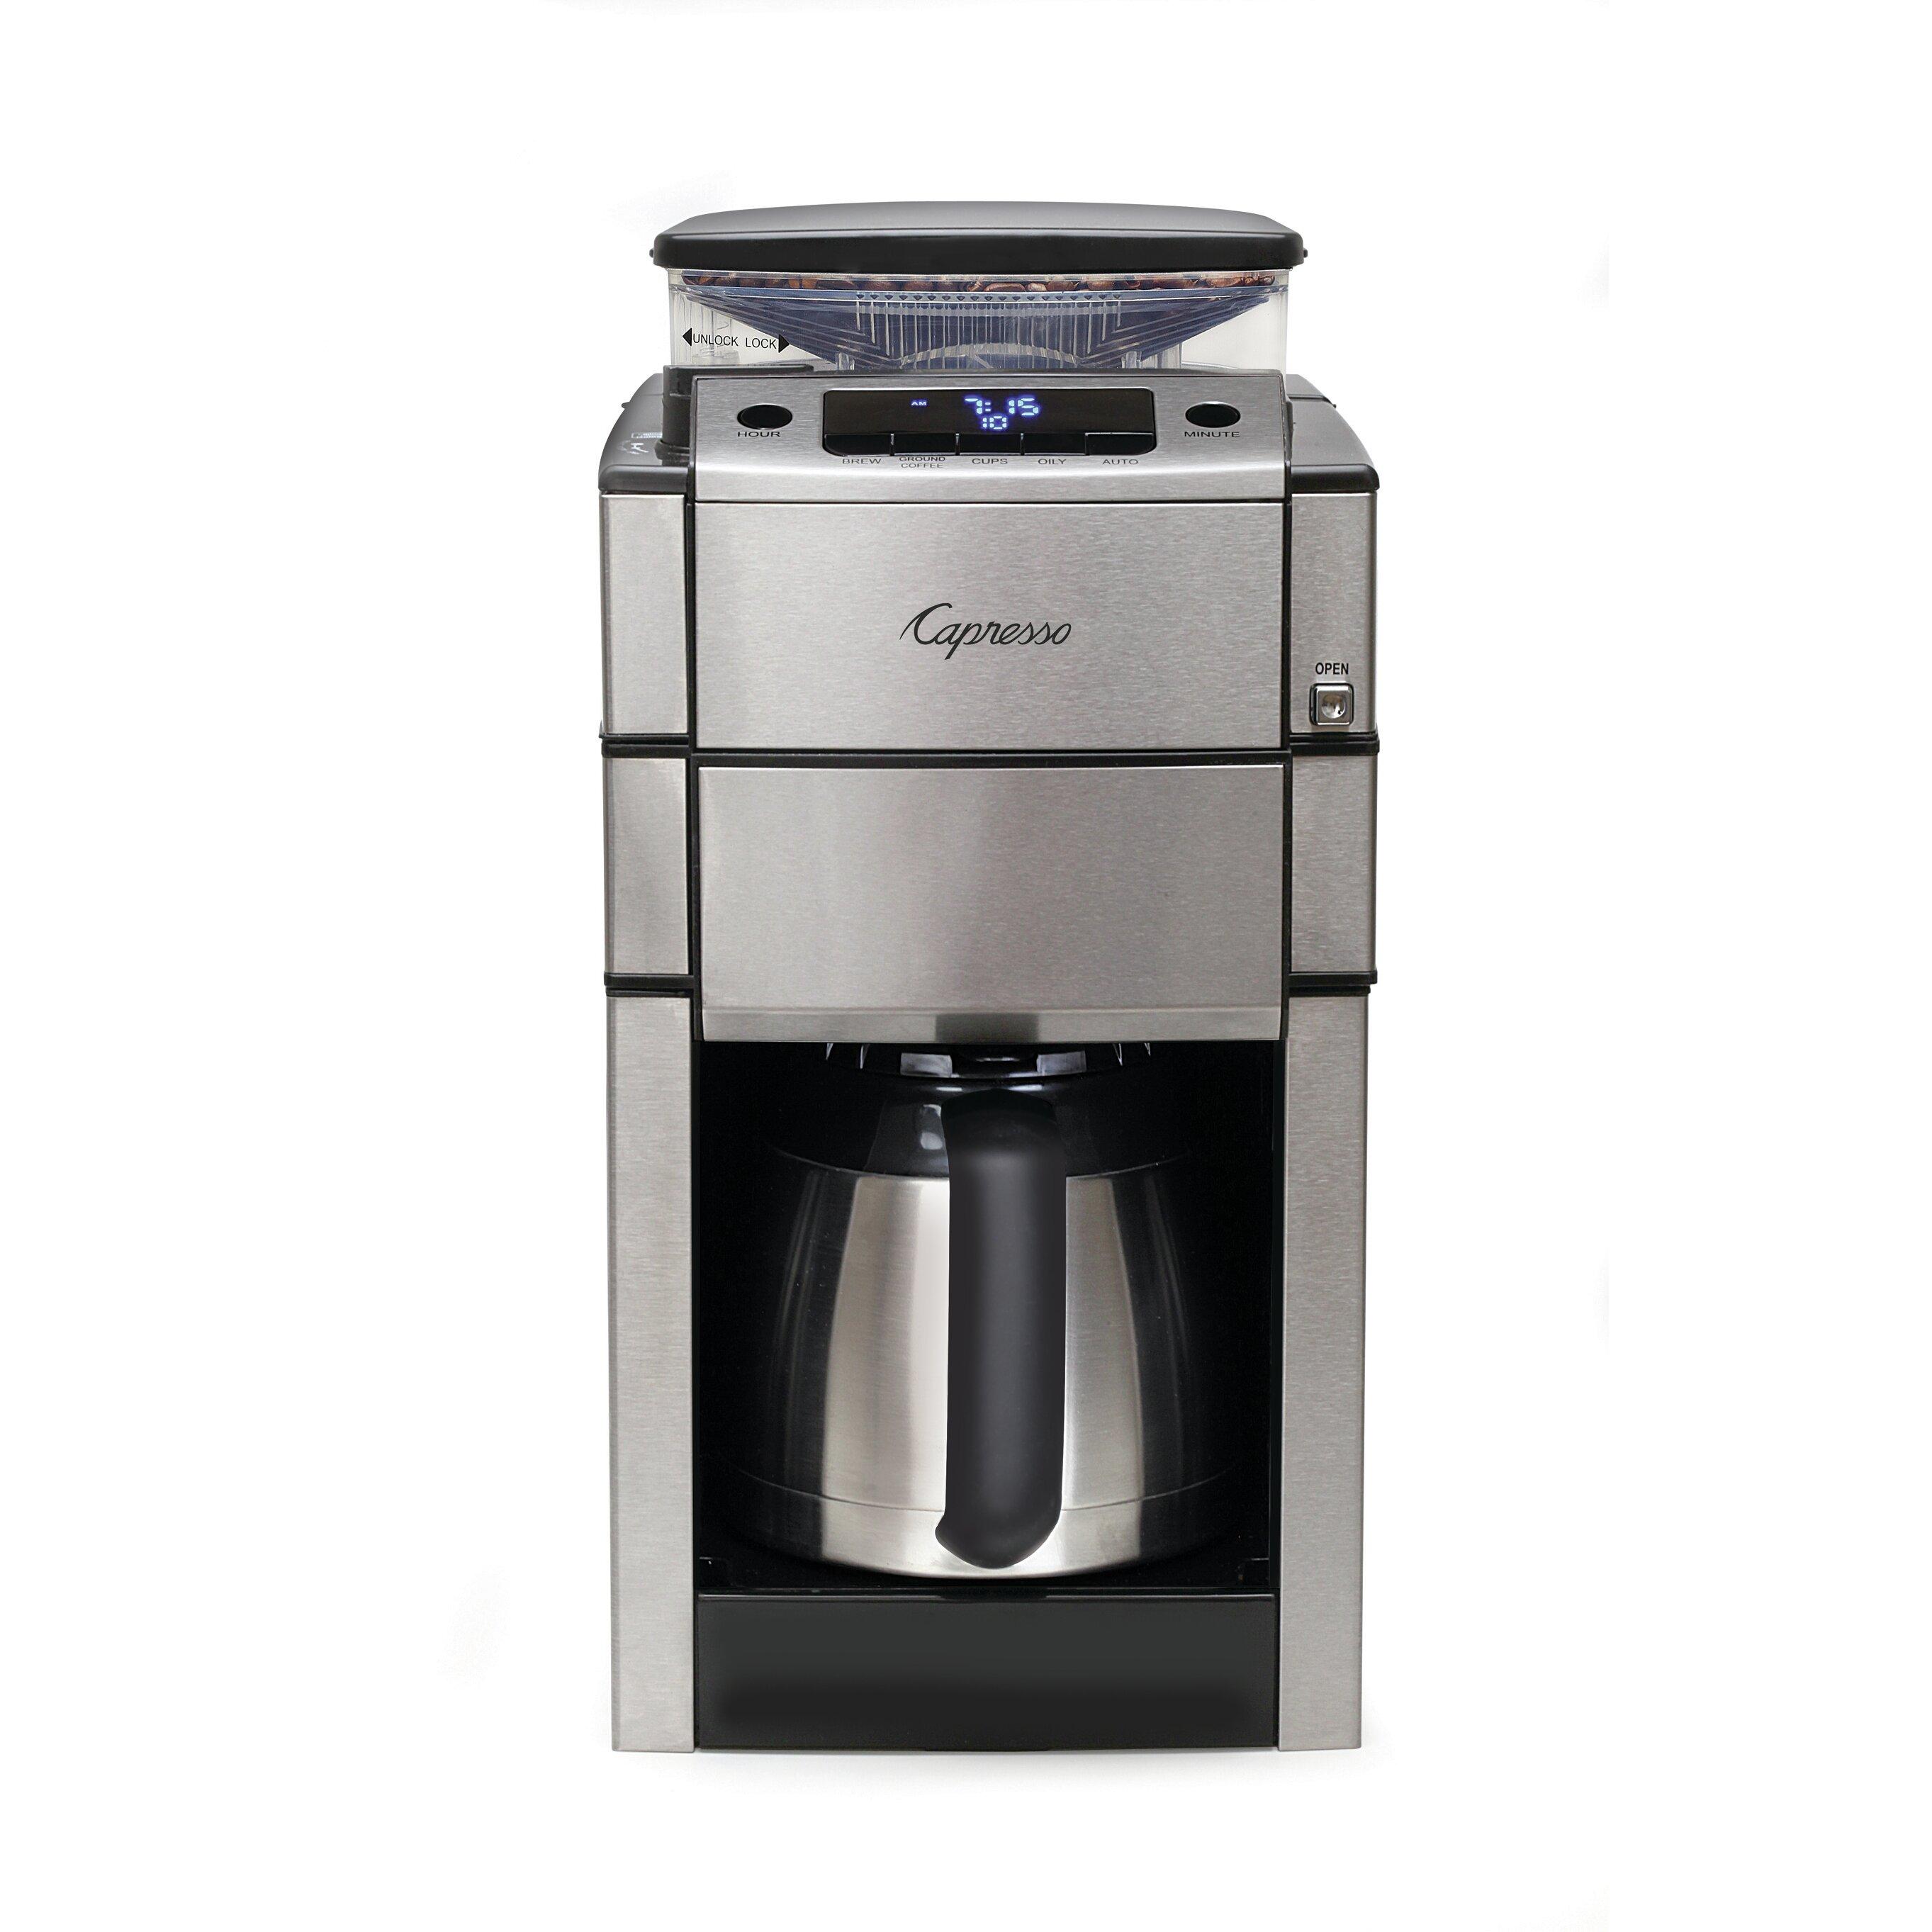 Capresso Coffee Team Pro Plus Coffee Maker & Reviews Wayfair